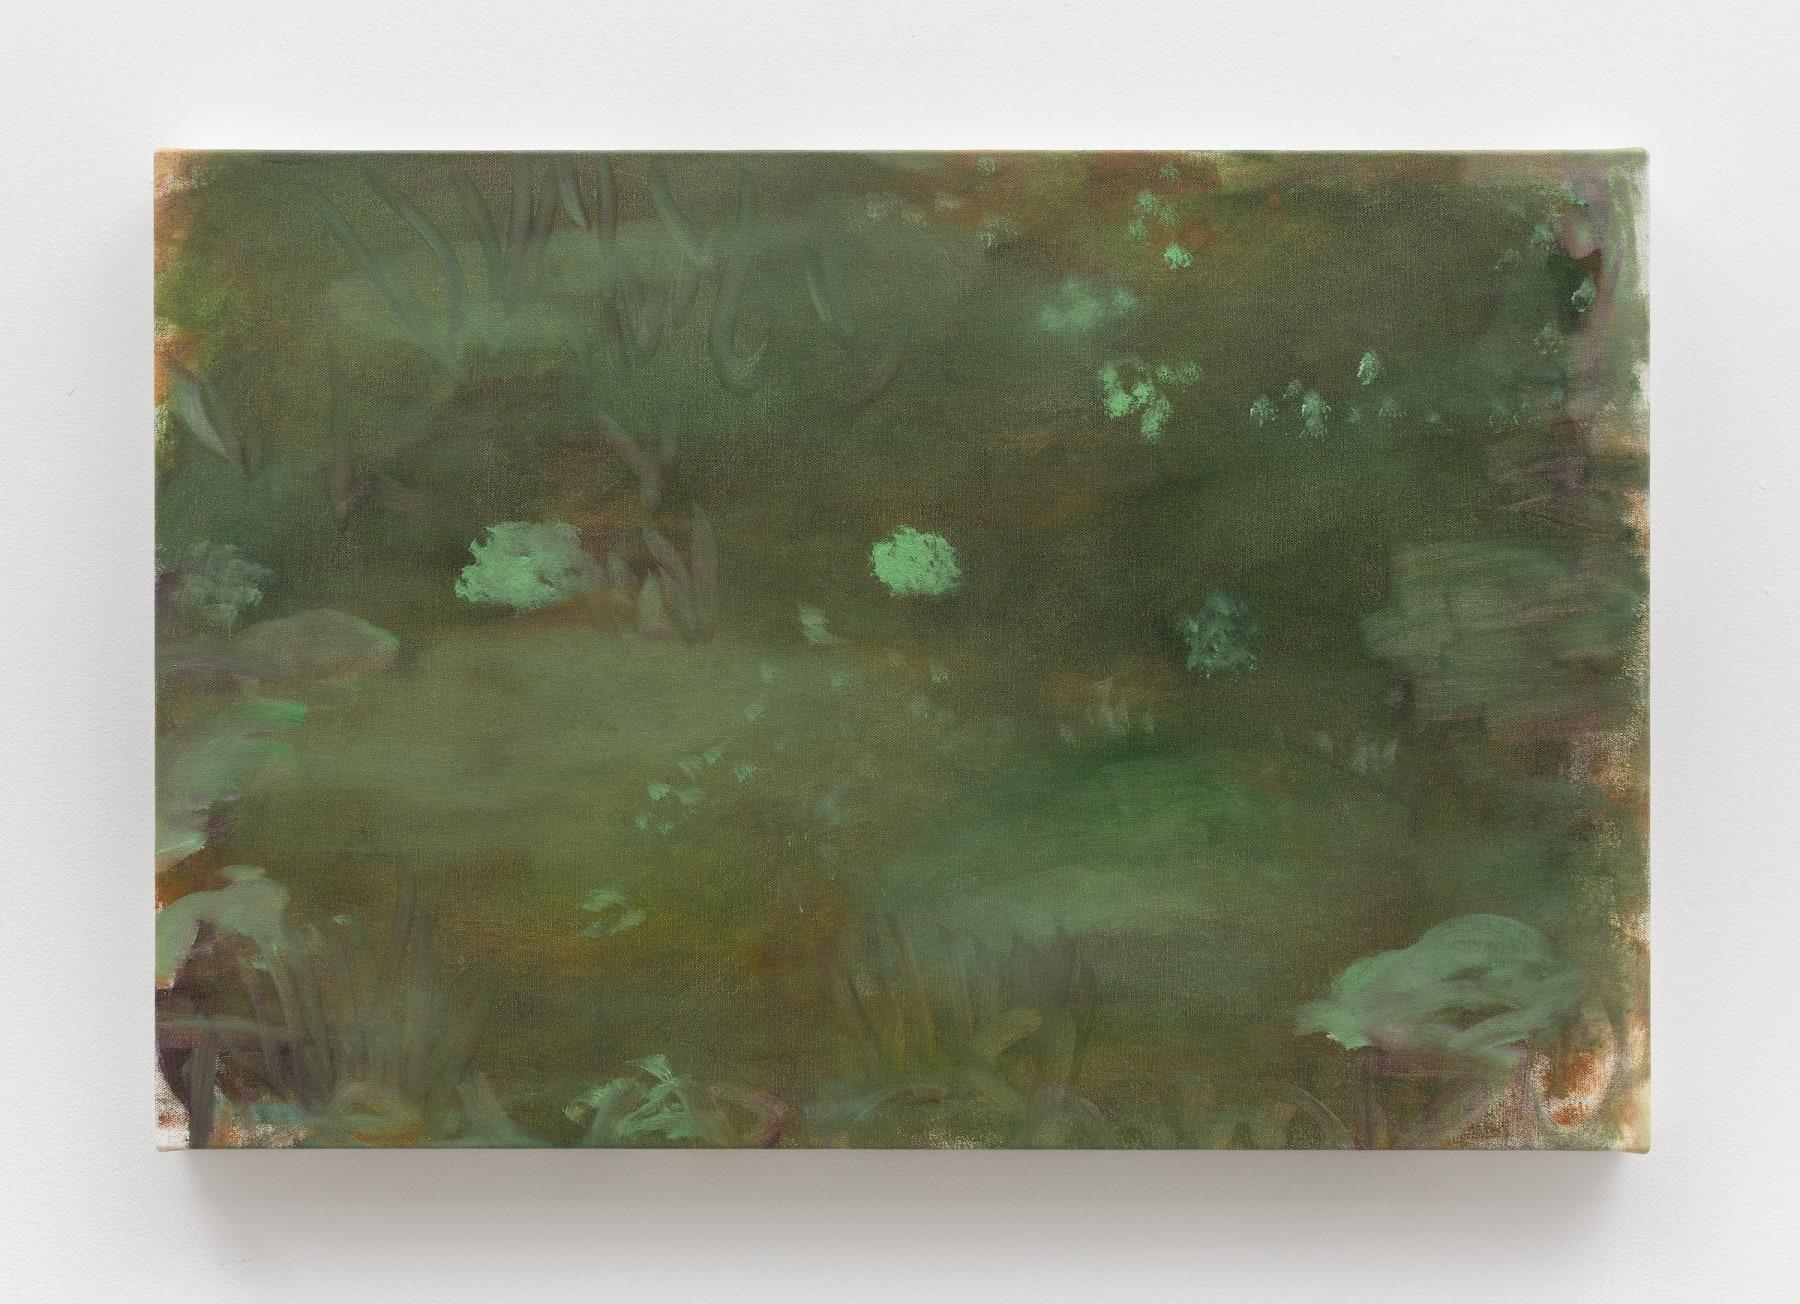 Trevor Shimizu, Moss (detail) (3), 2019